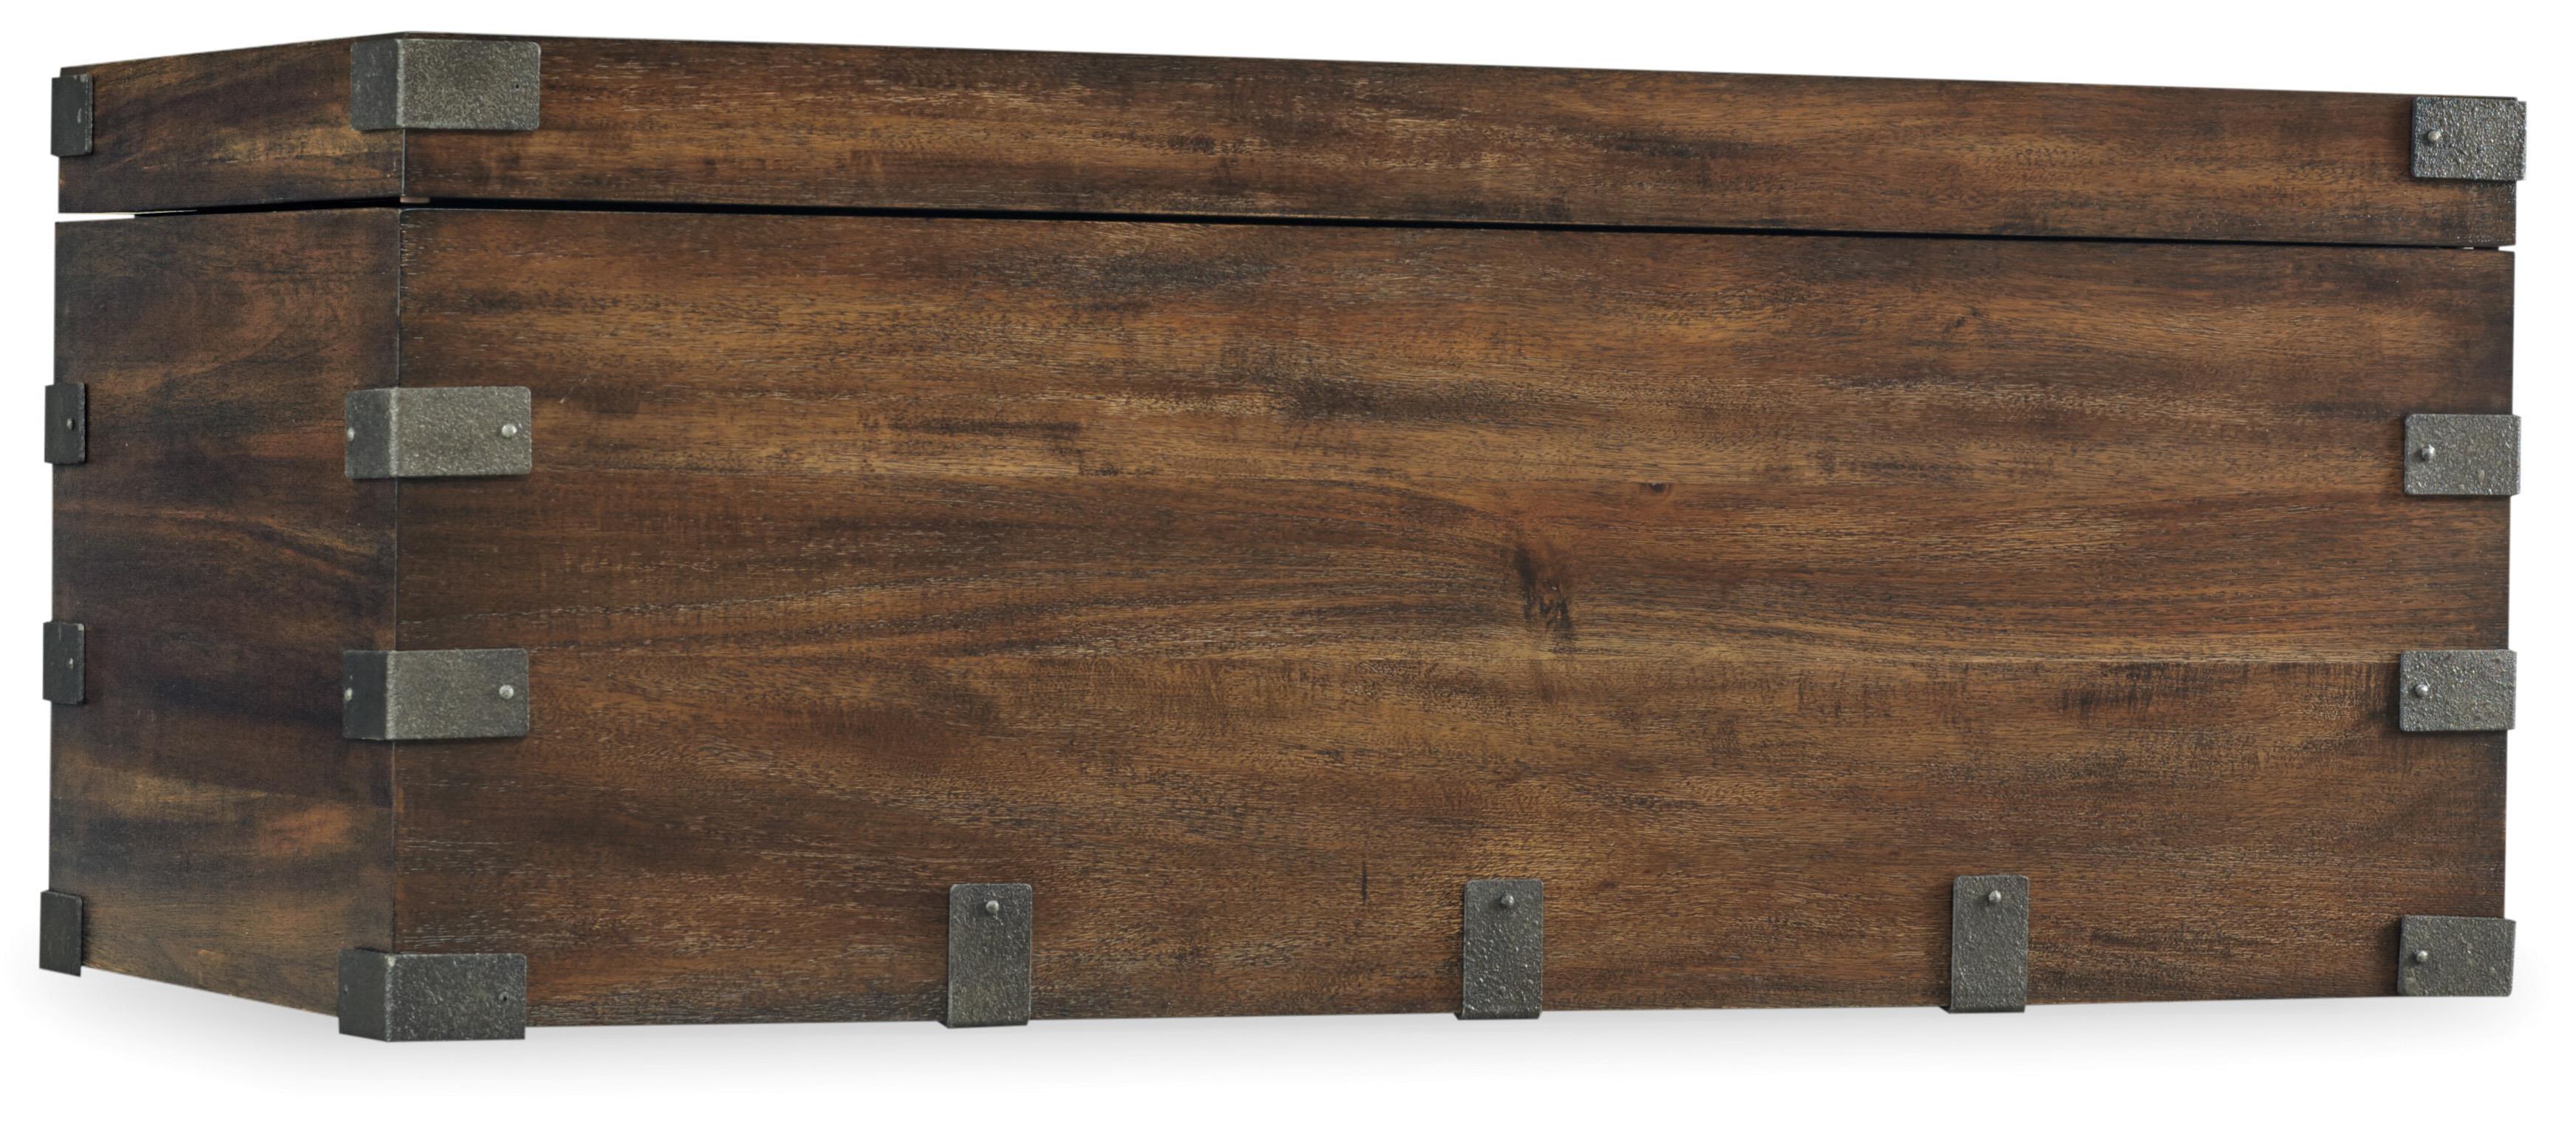 Hooker Furniture Studio 7H Finders Keepers Storage Trunk - Item Number: 5388-50001